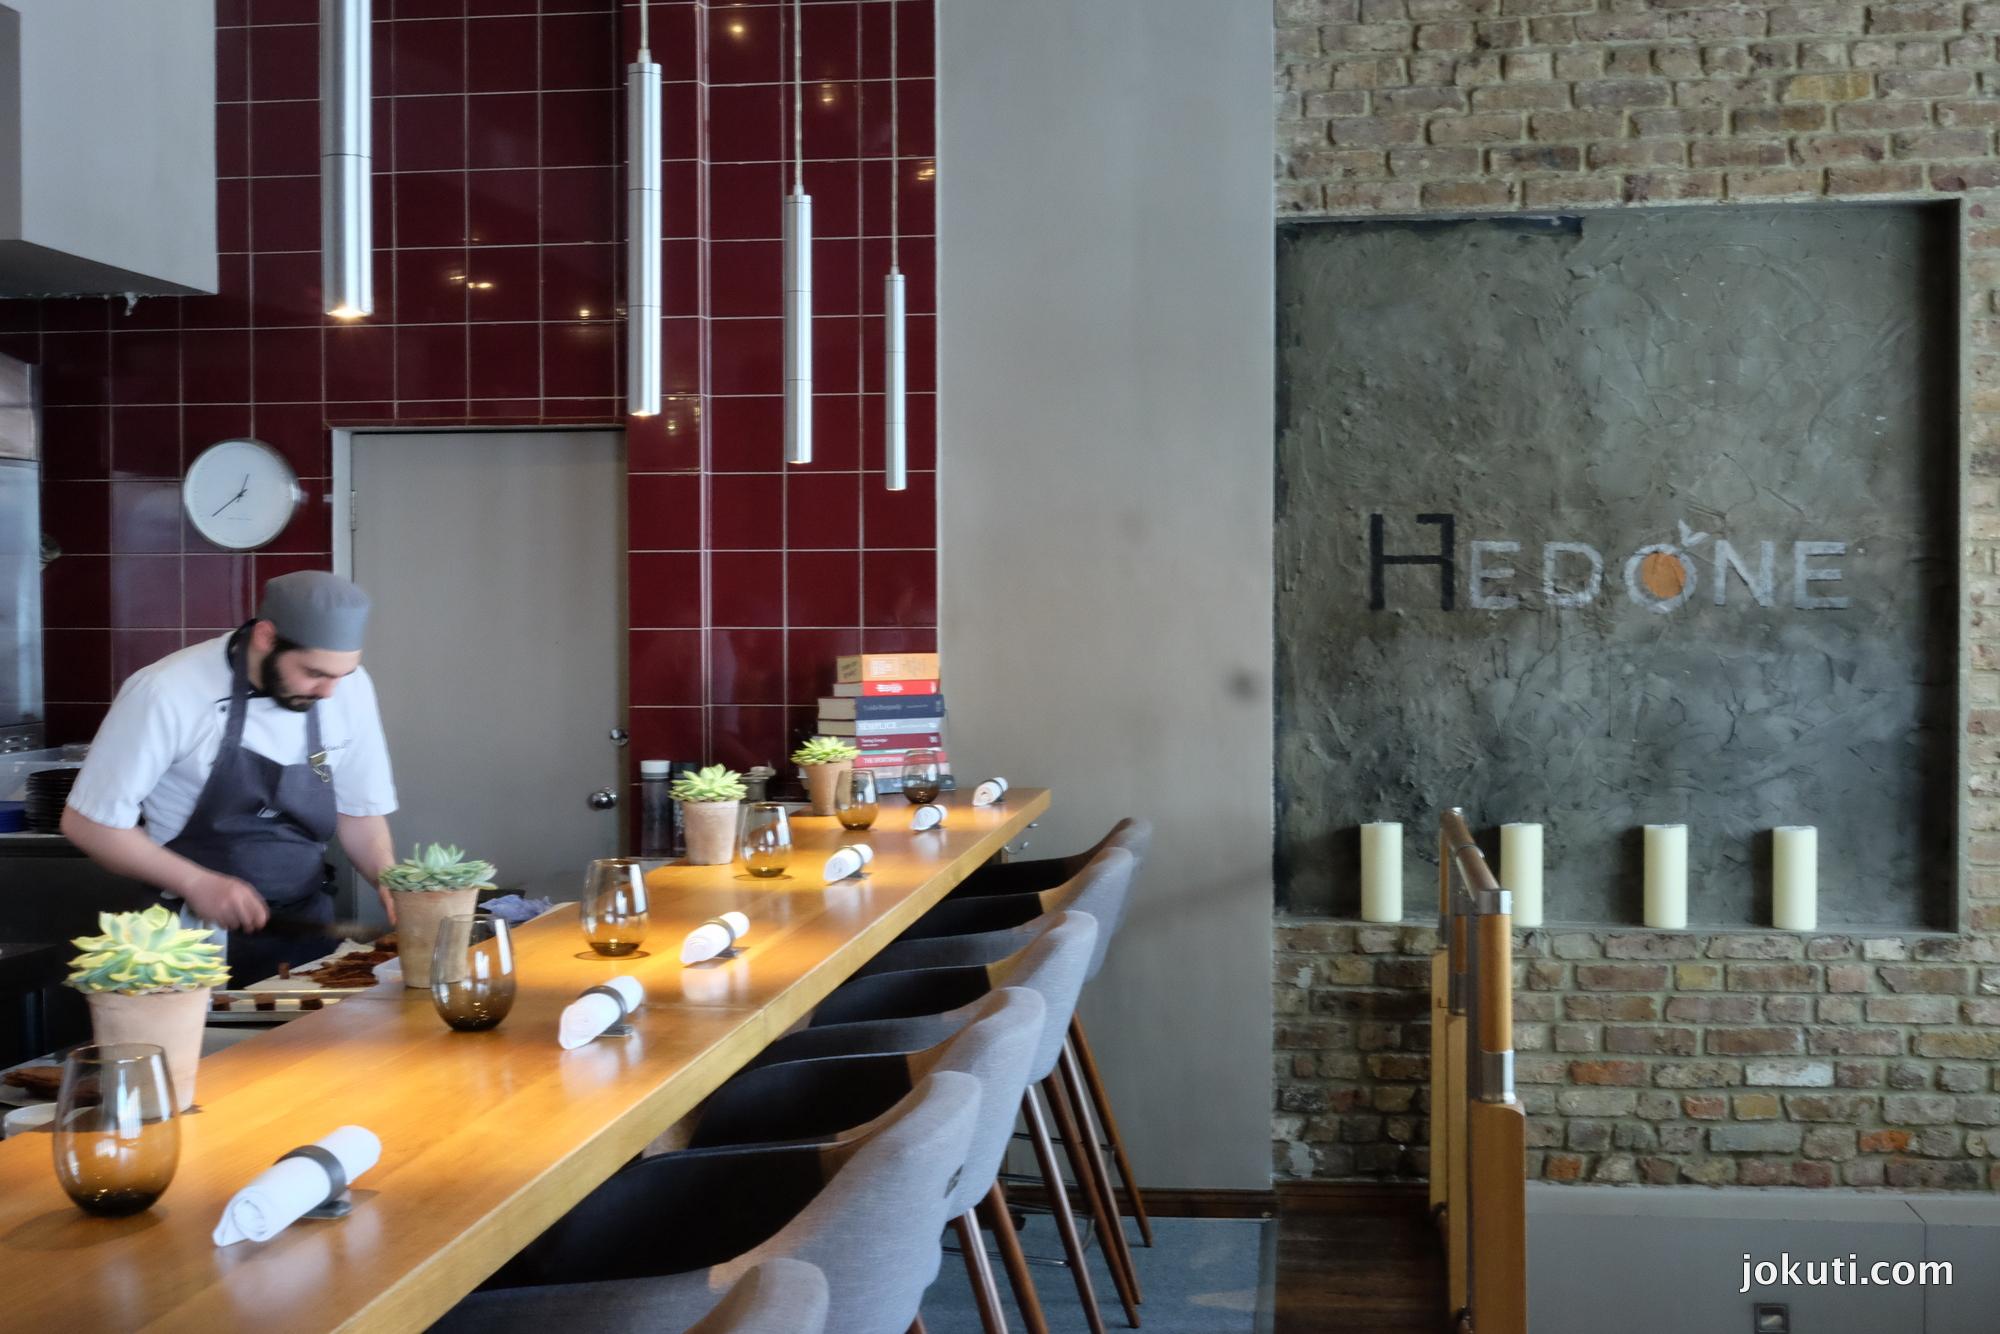 dscf5340_hedone_london_chiswick_mikael_jonsson_restaurant_vilagevo_jokuti.jpg